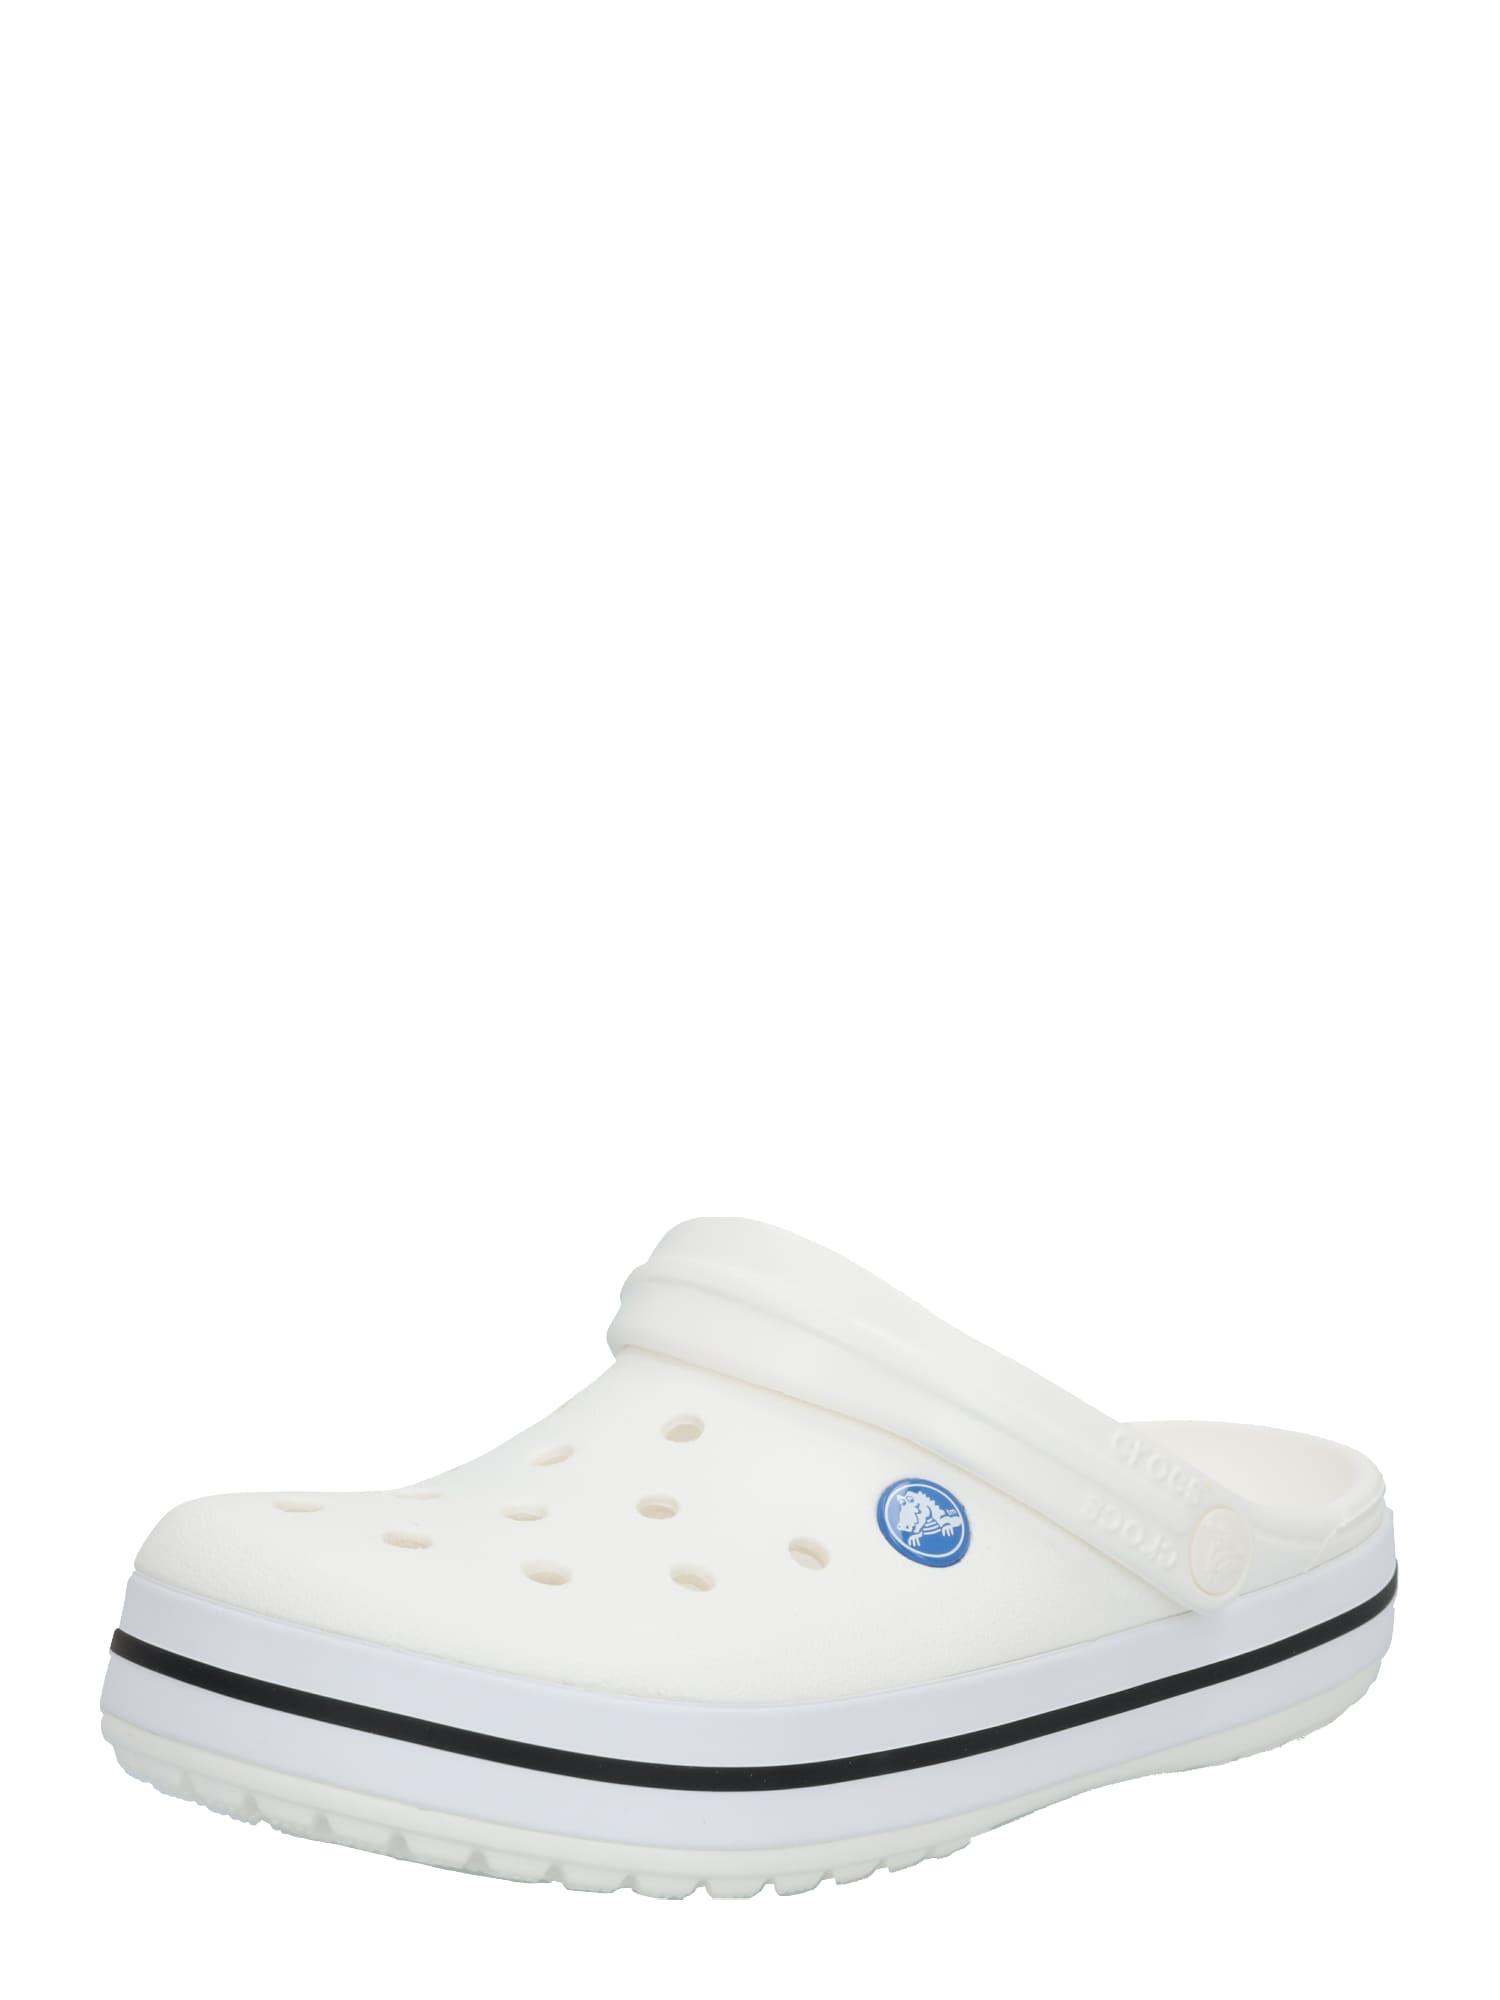 Crocs Sabots 'Crocband'  - Blanc - Taille: M12 - male